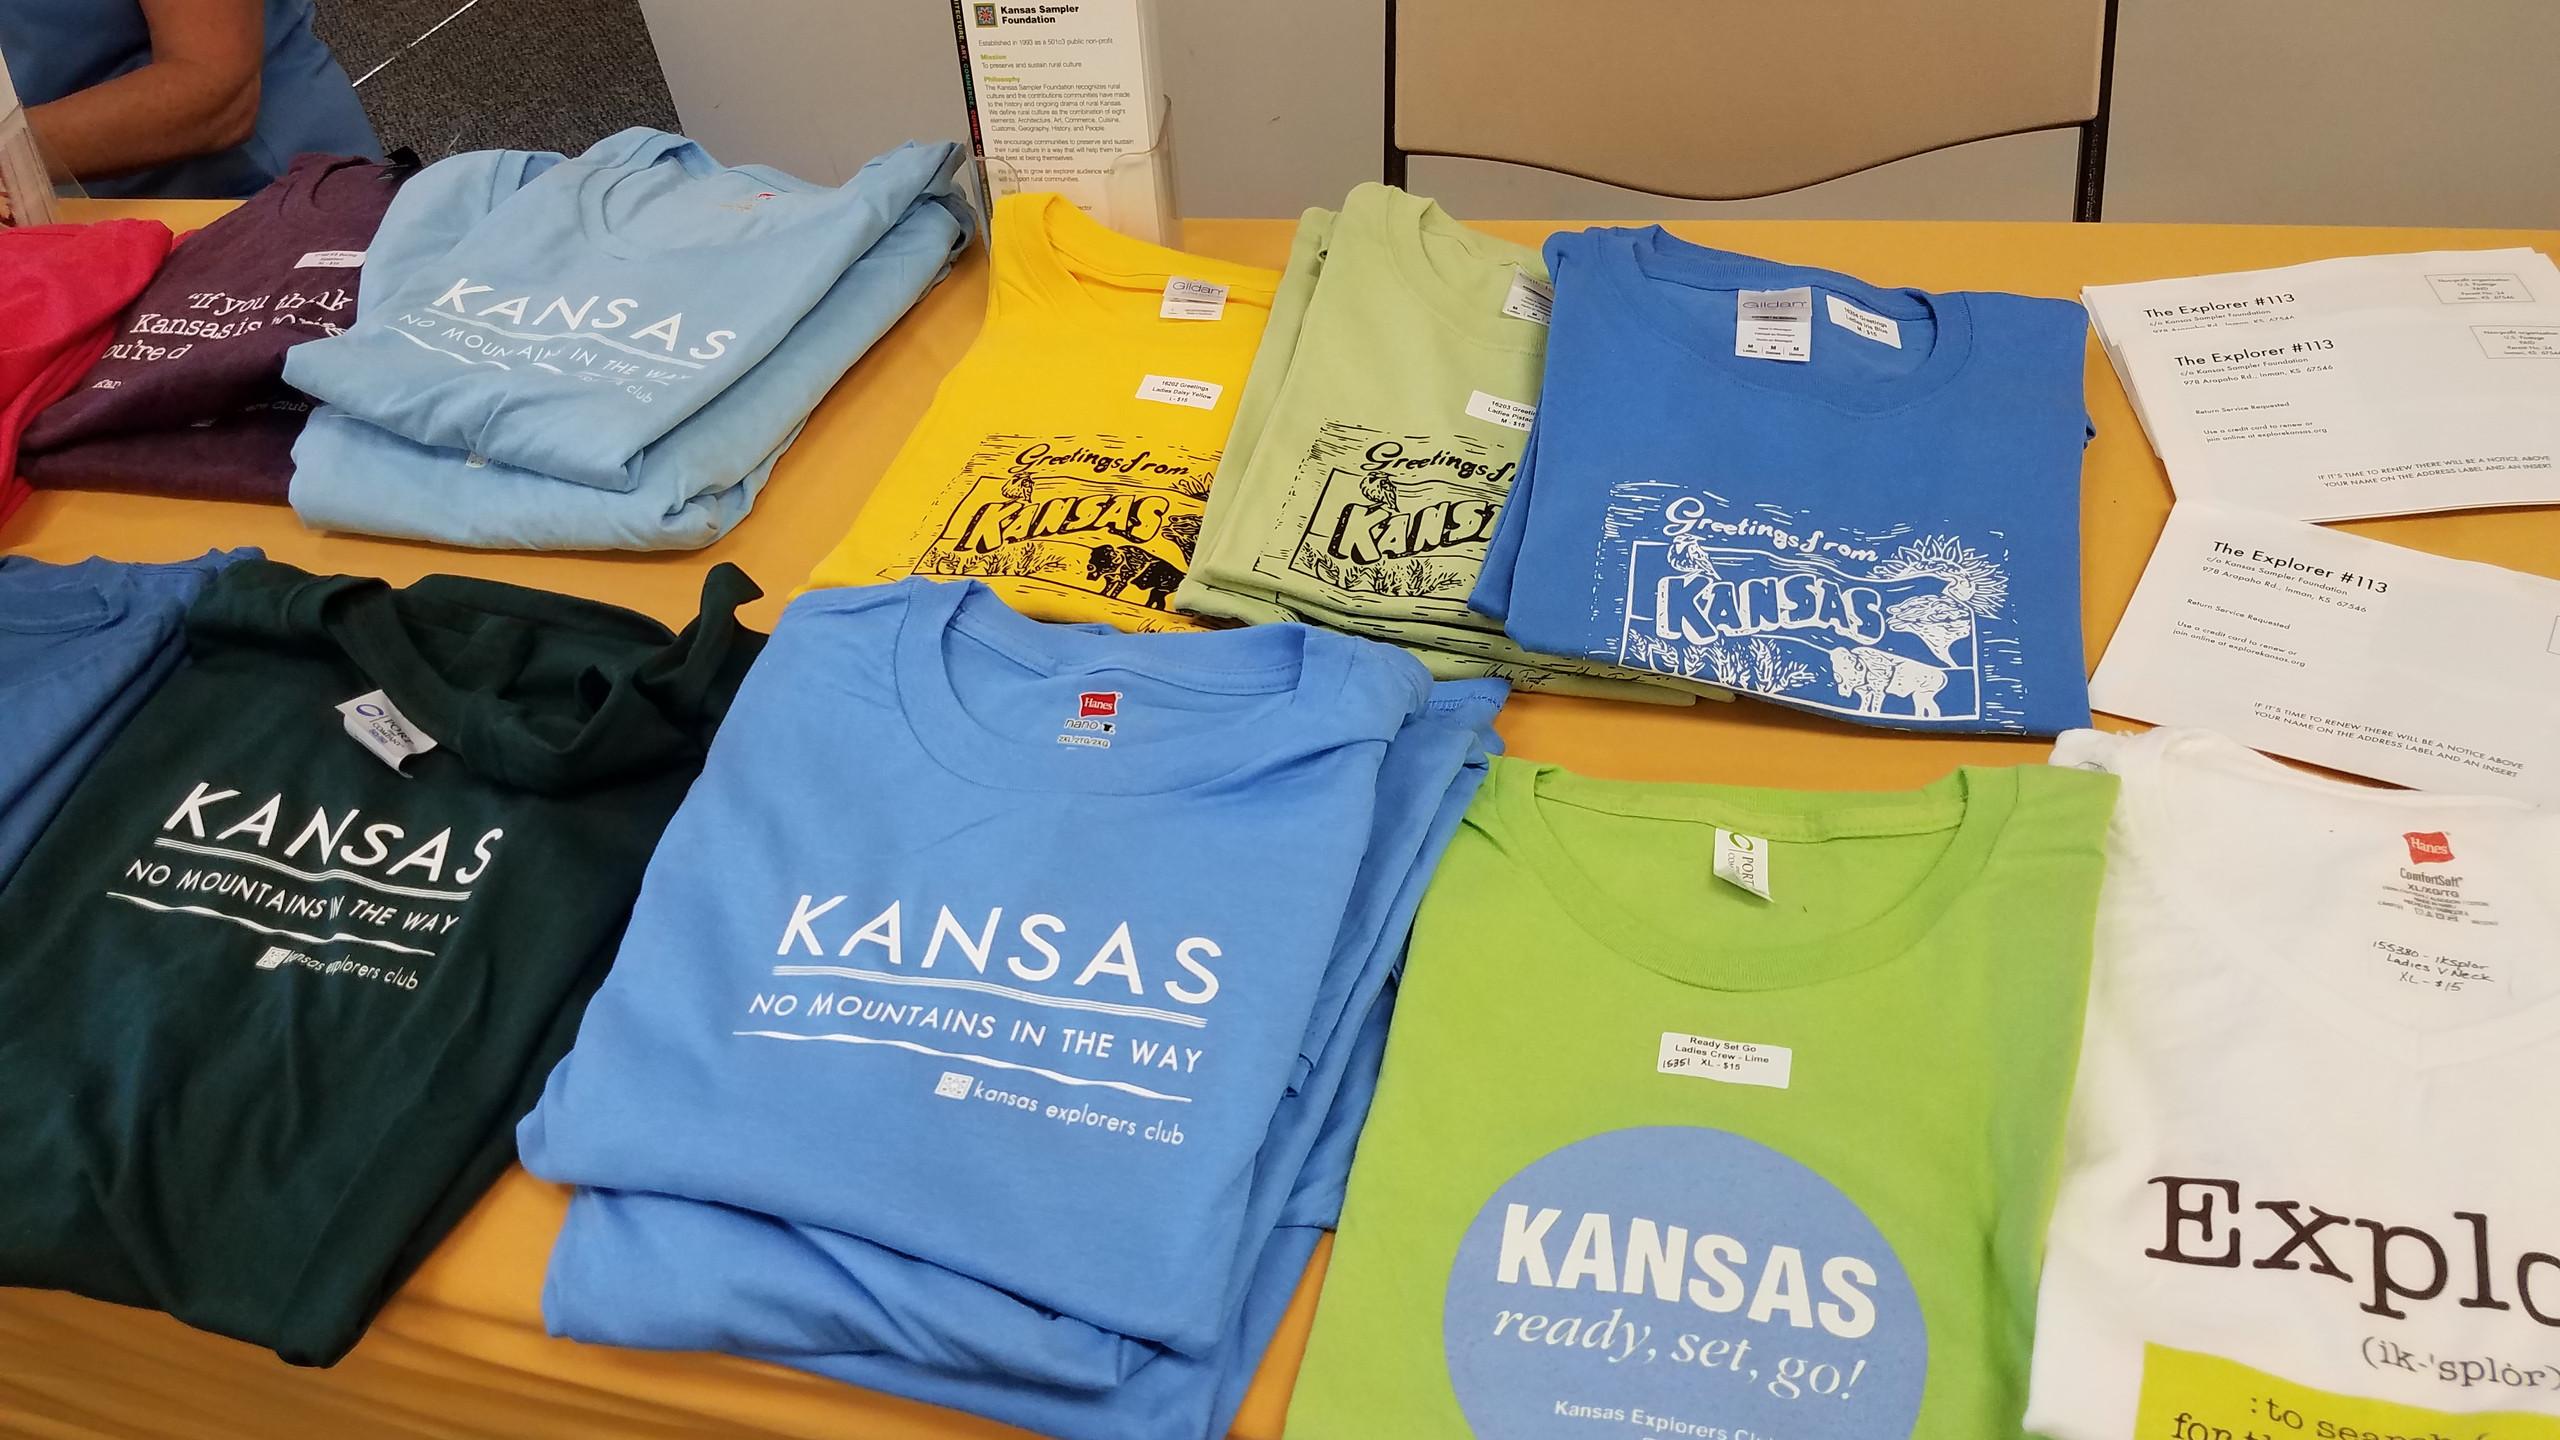 Kansas Explorers Club T-Shirts